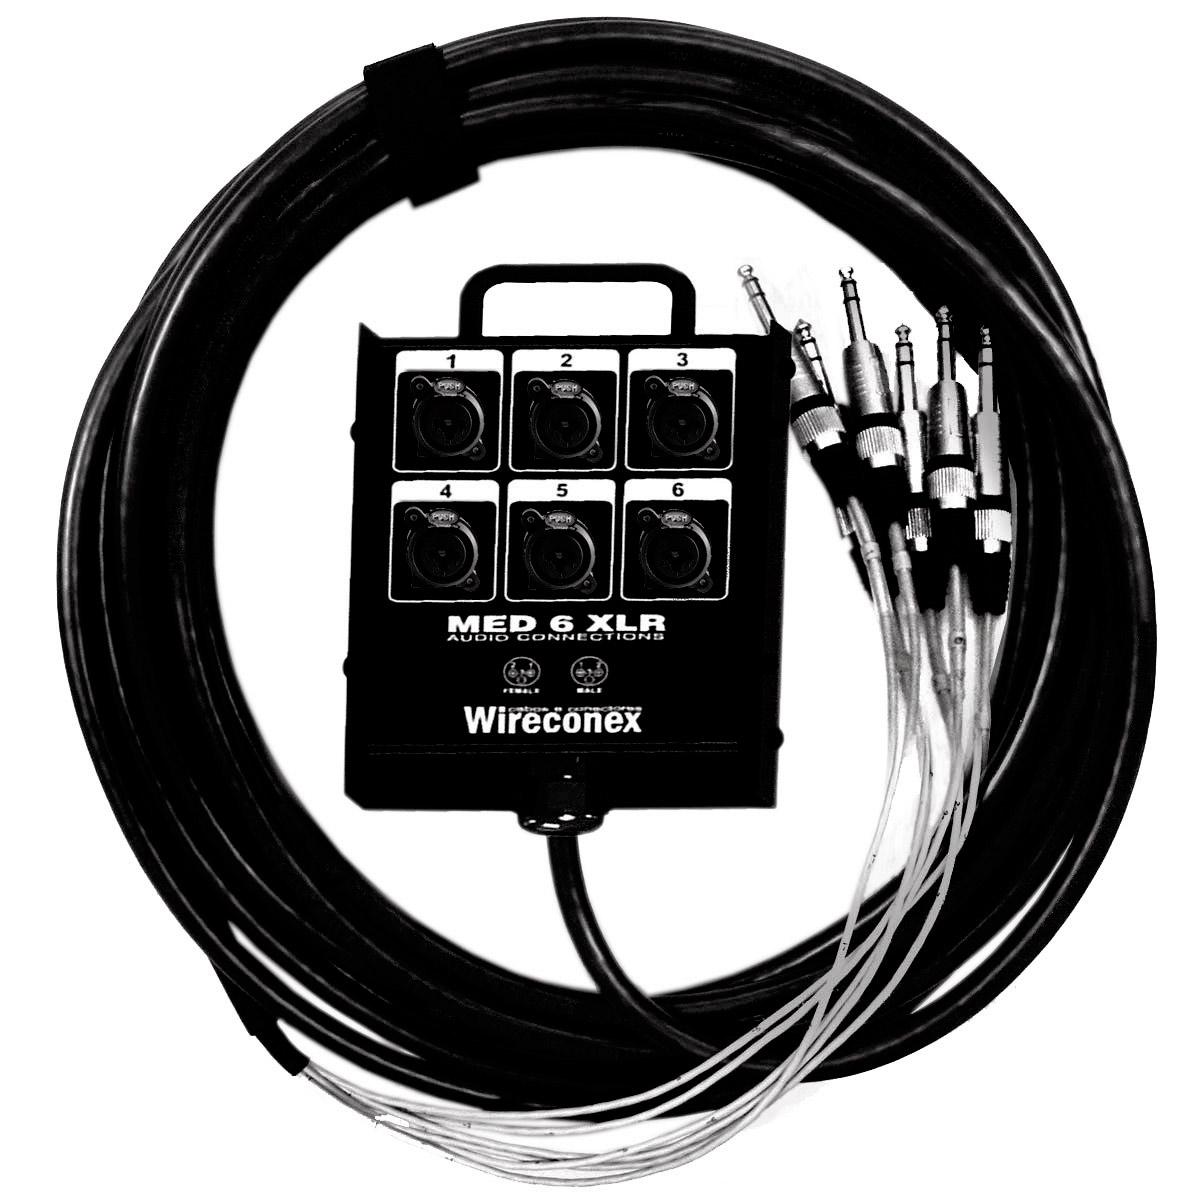 Multicabo Completo 06 Vias Combo XLR / P10 c/ Trava 15 Metros - VR CABOS